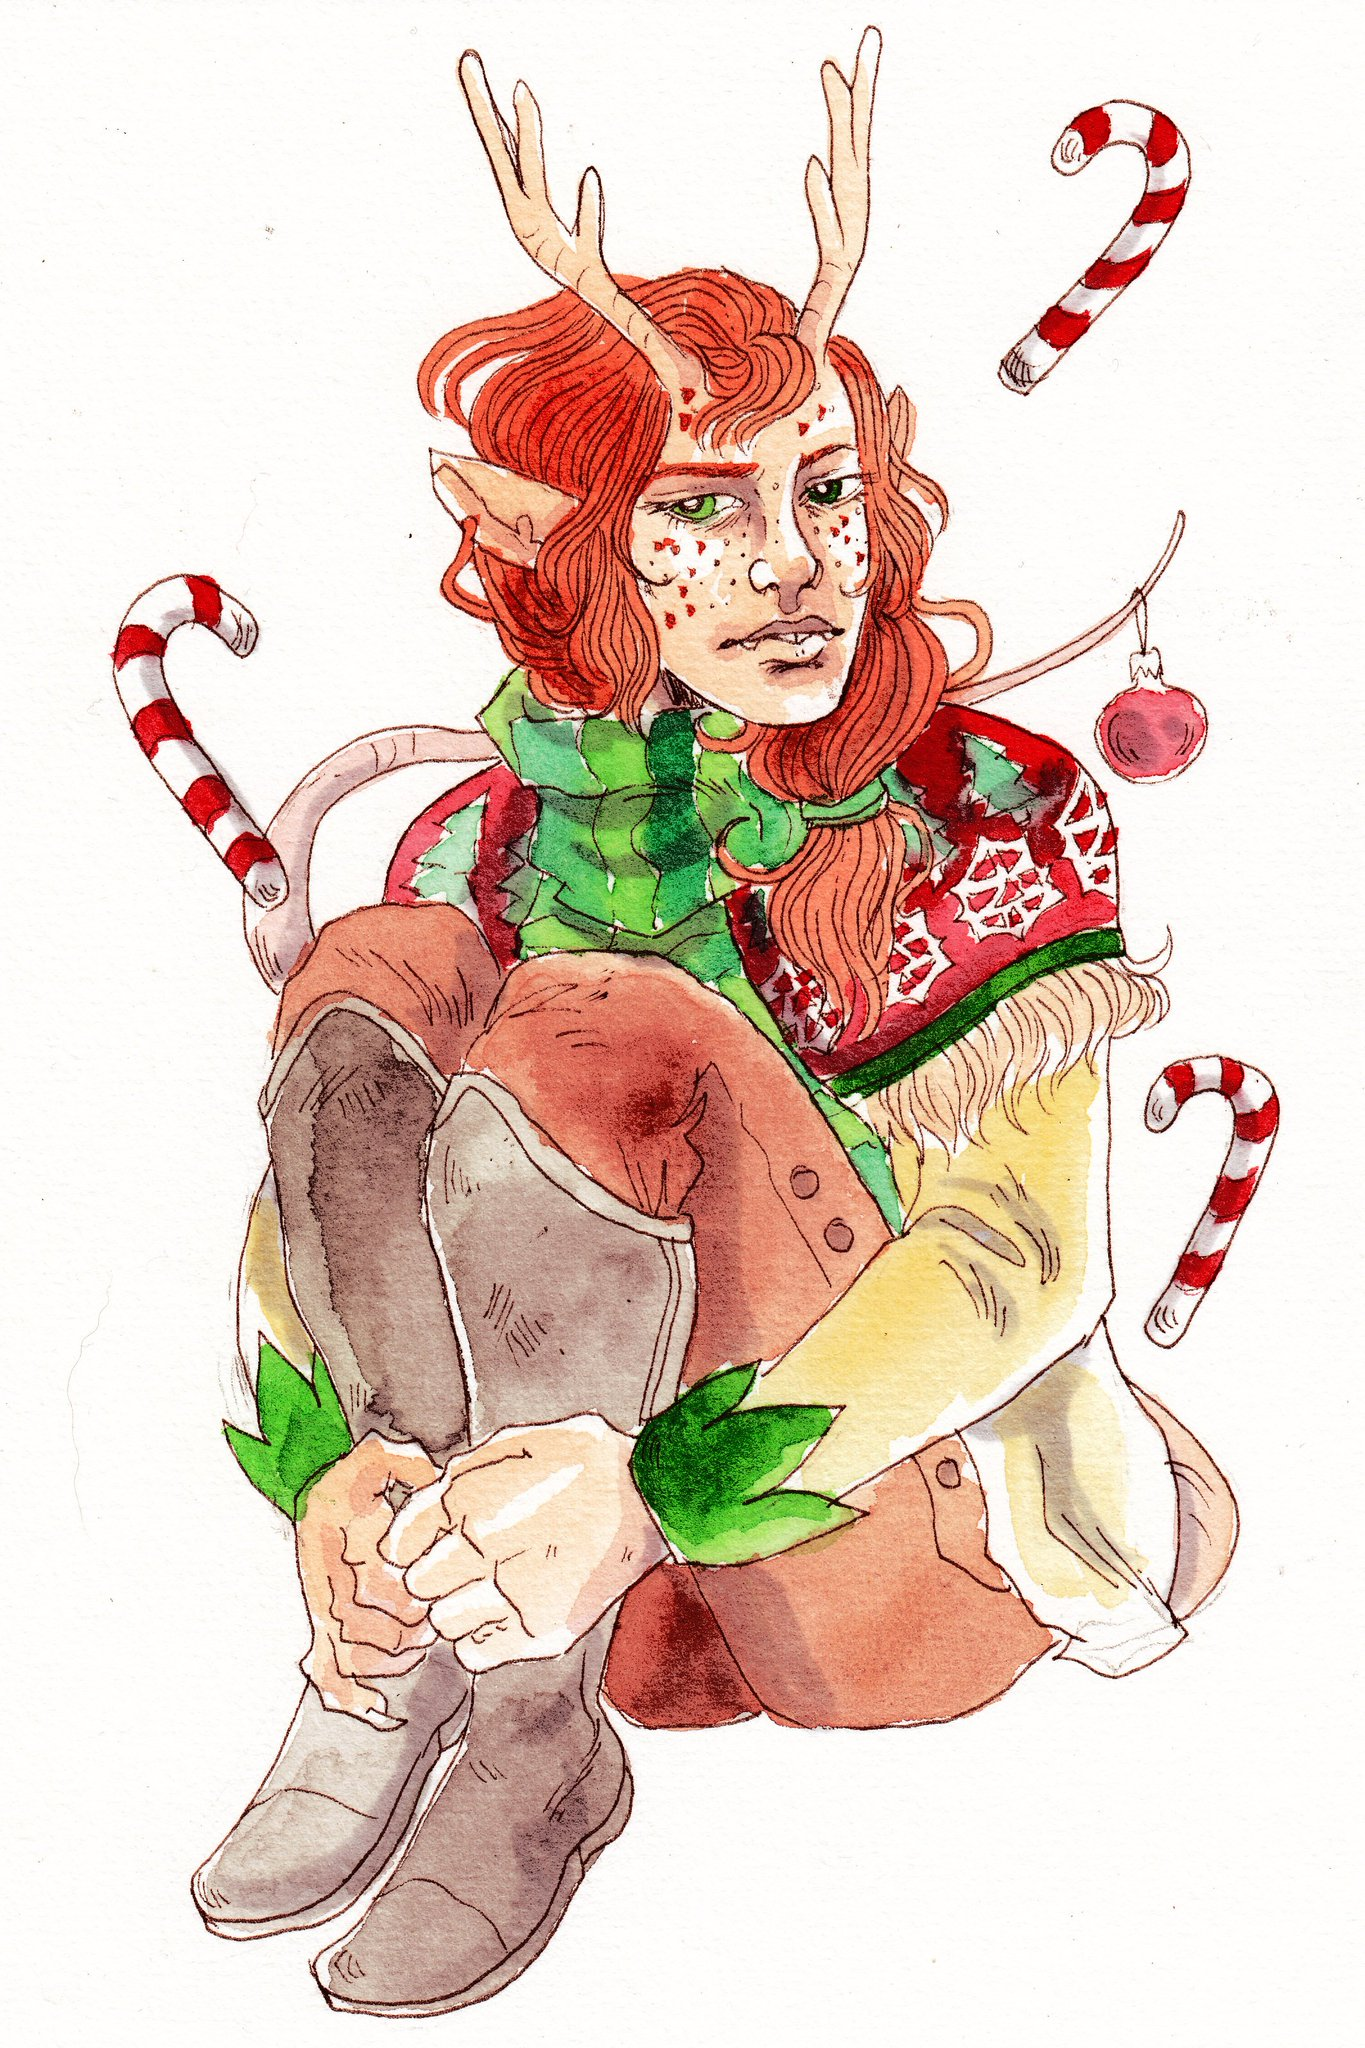 kayla-cline Tiefling natalizia - by Kayla Cline www.kaylacline.com (2017-12) © dell'autore, tutti i diritti riservati